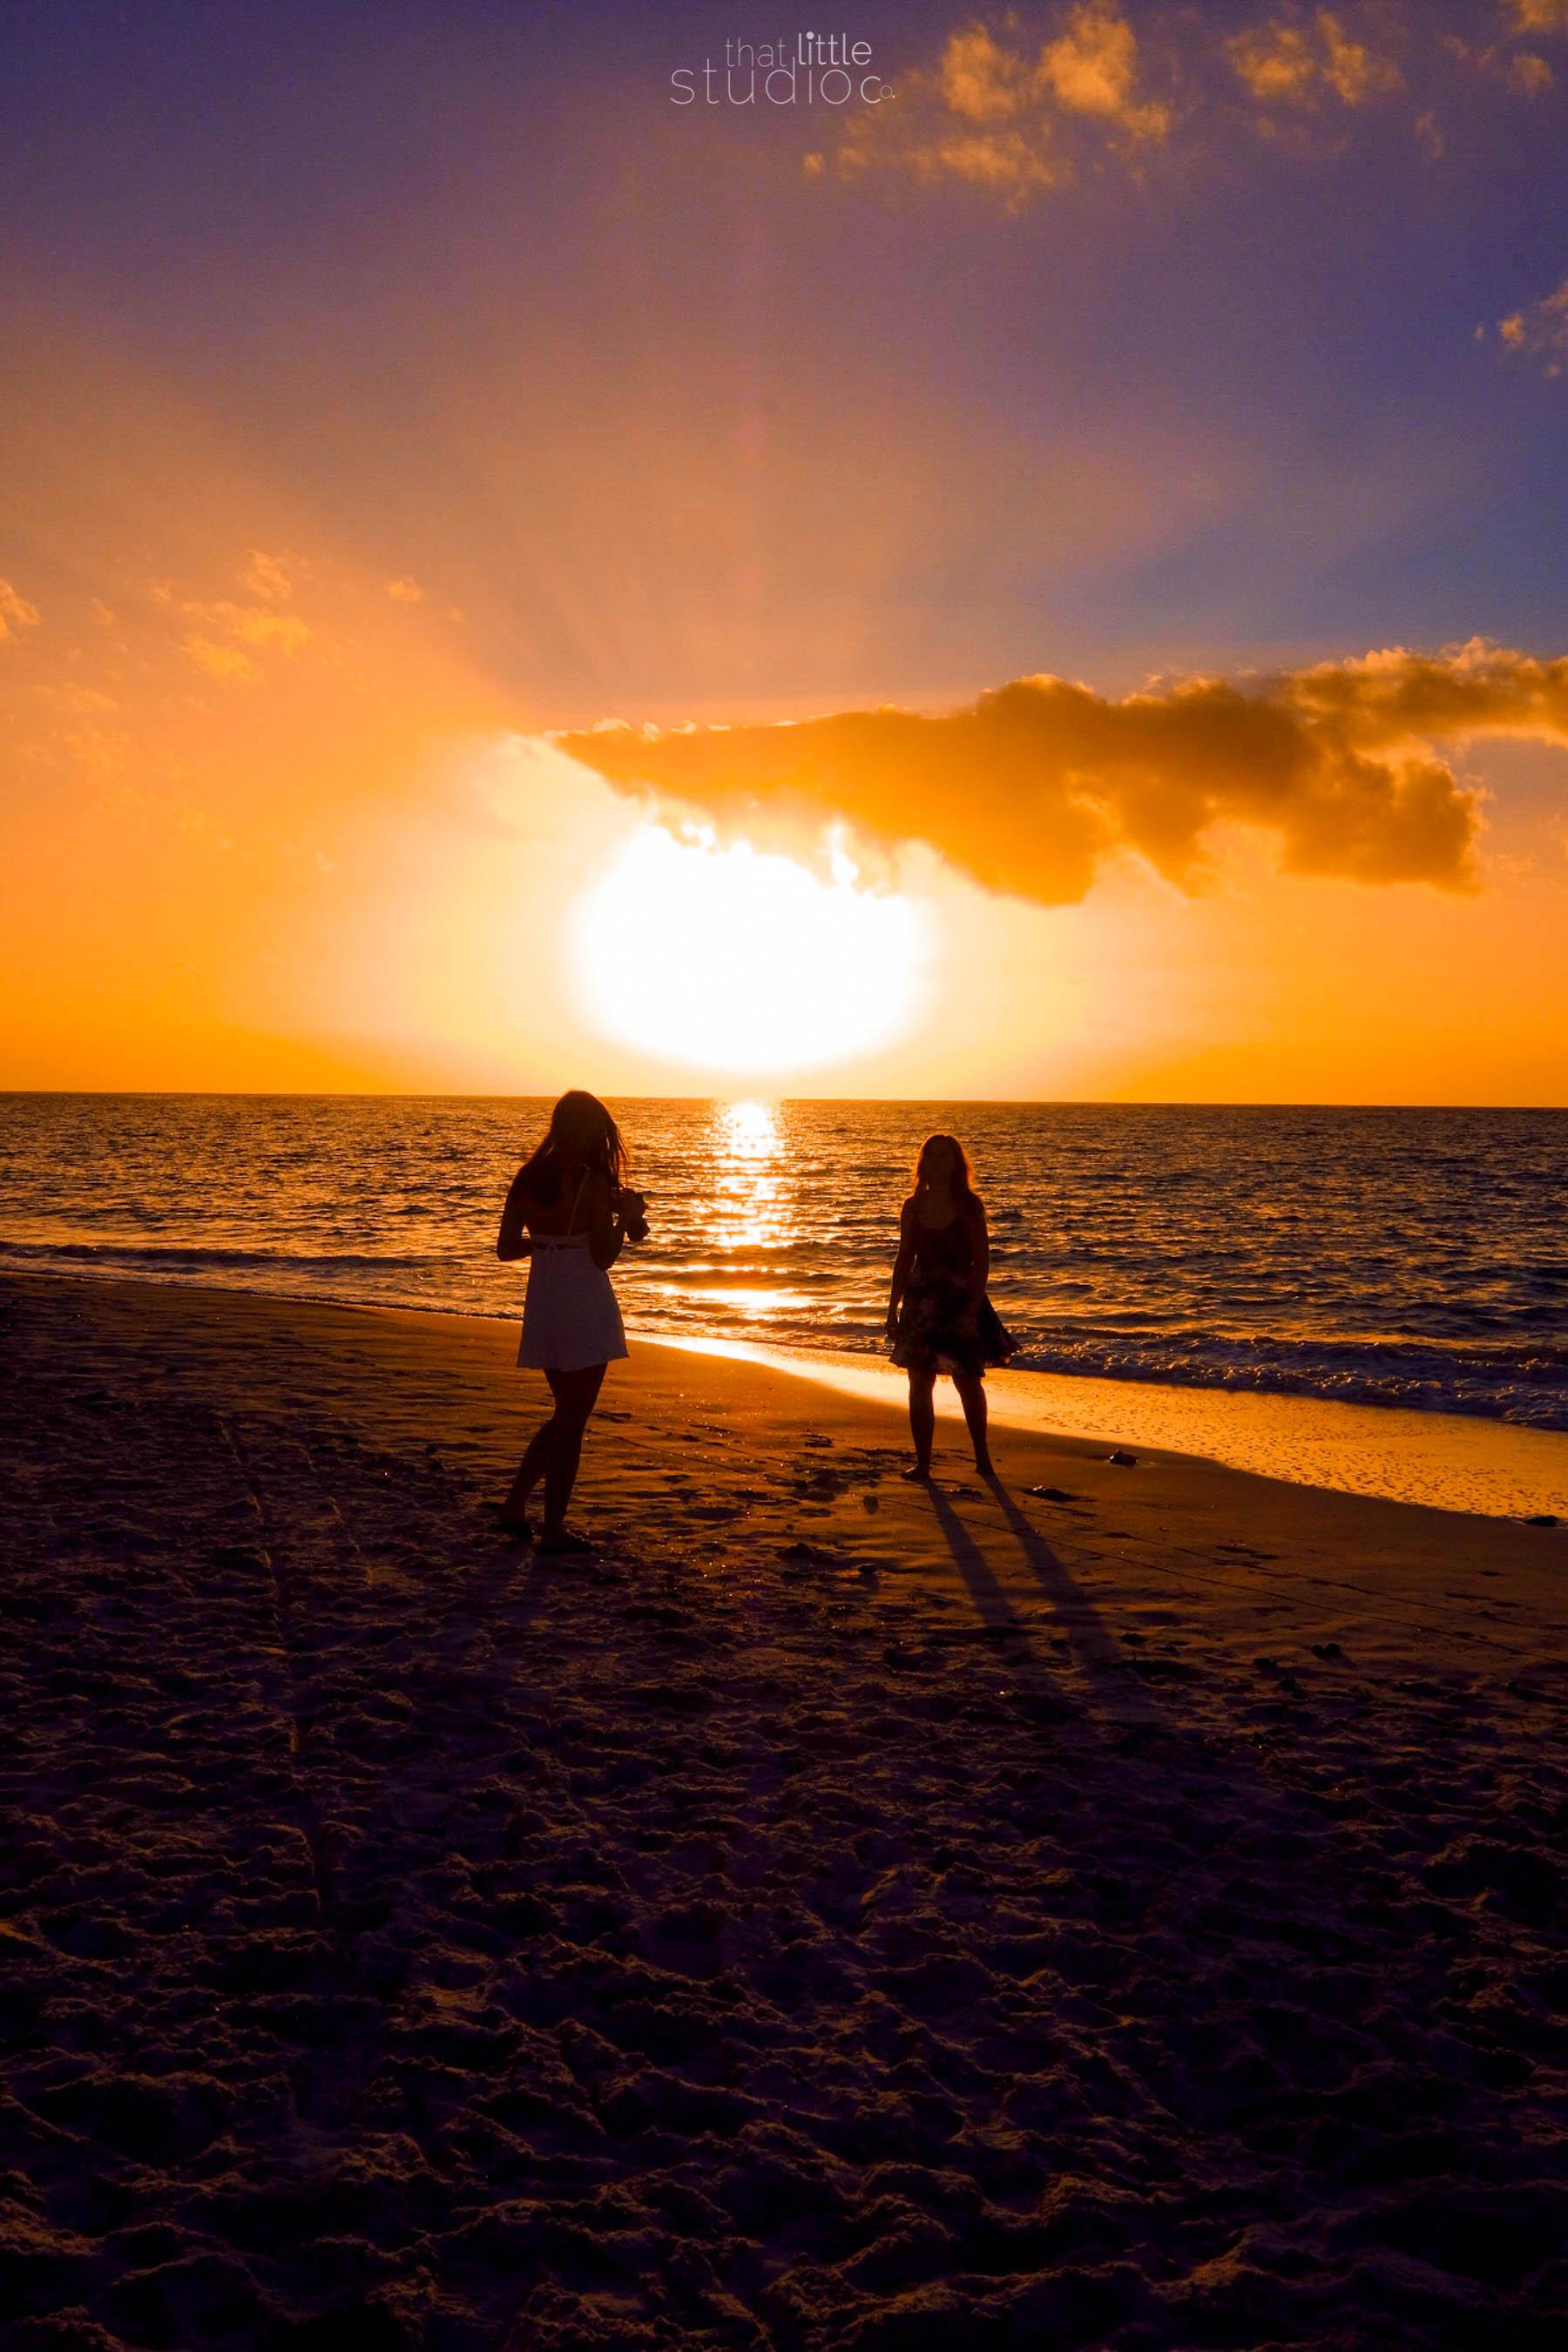 Tess-Maree-Photography-Travel-Australia-Port-Willunga-5.jpg